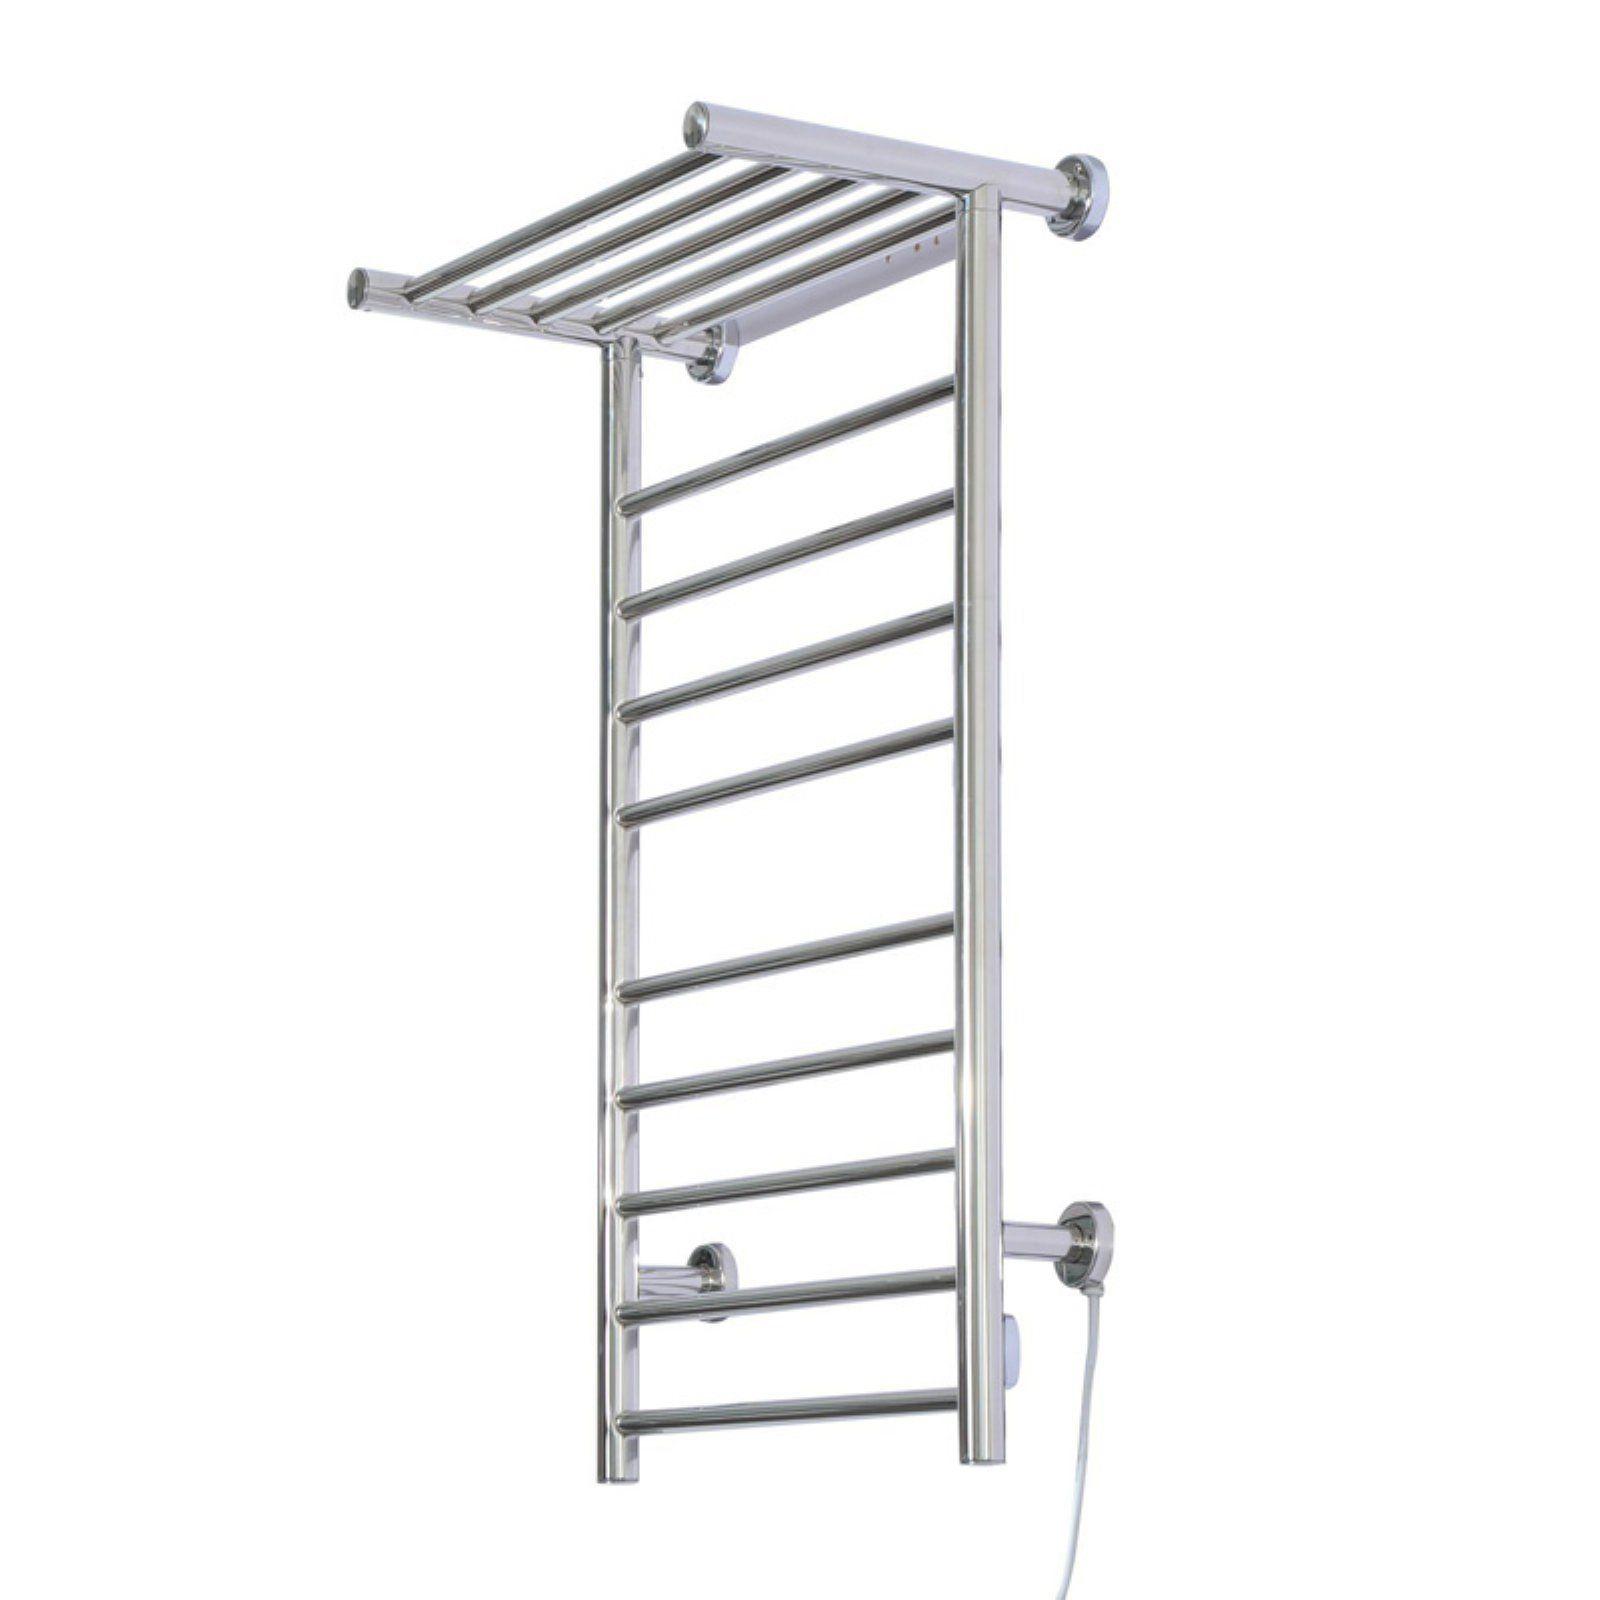 Wall Mounted Heated Towel Warmer Rack with Shelf